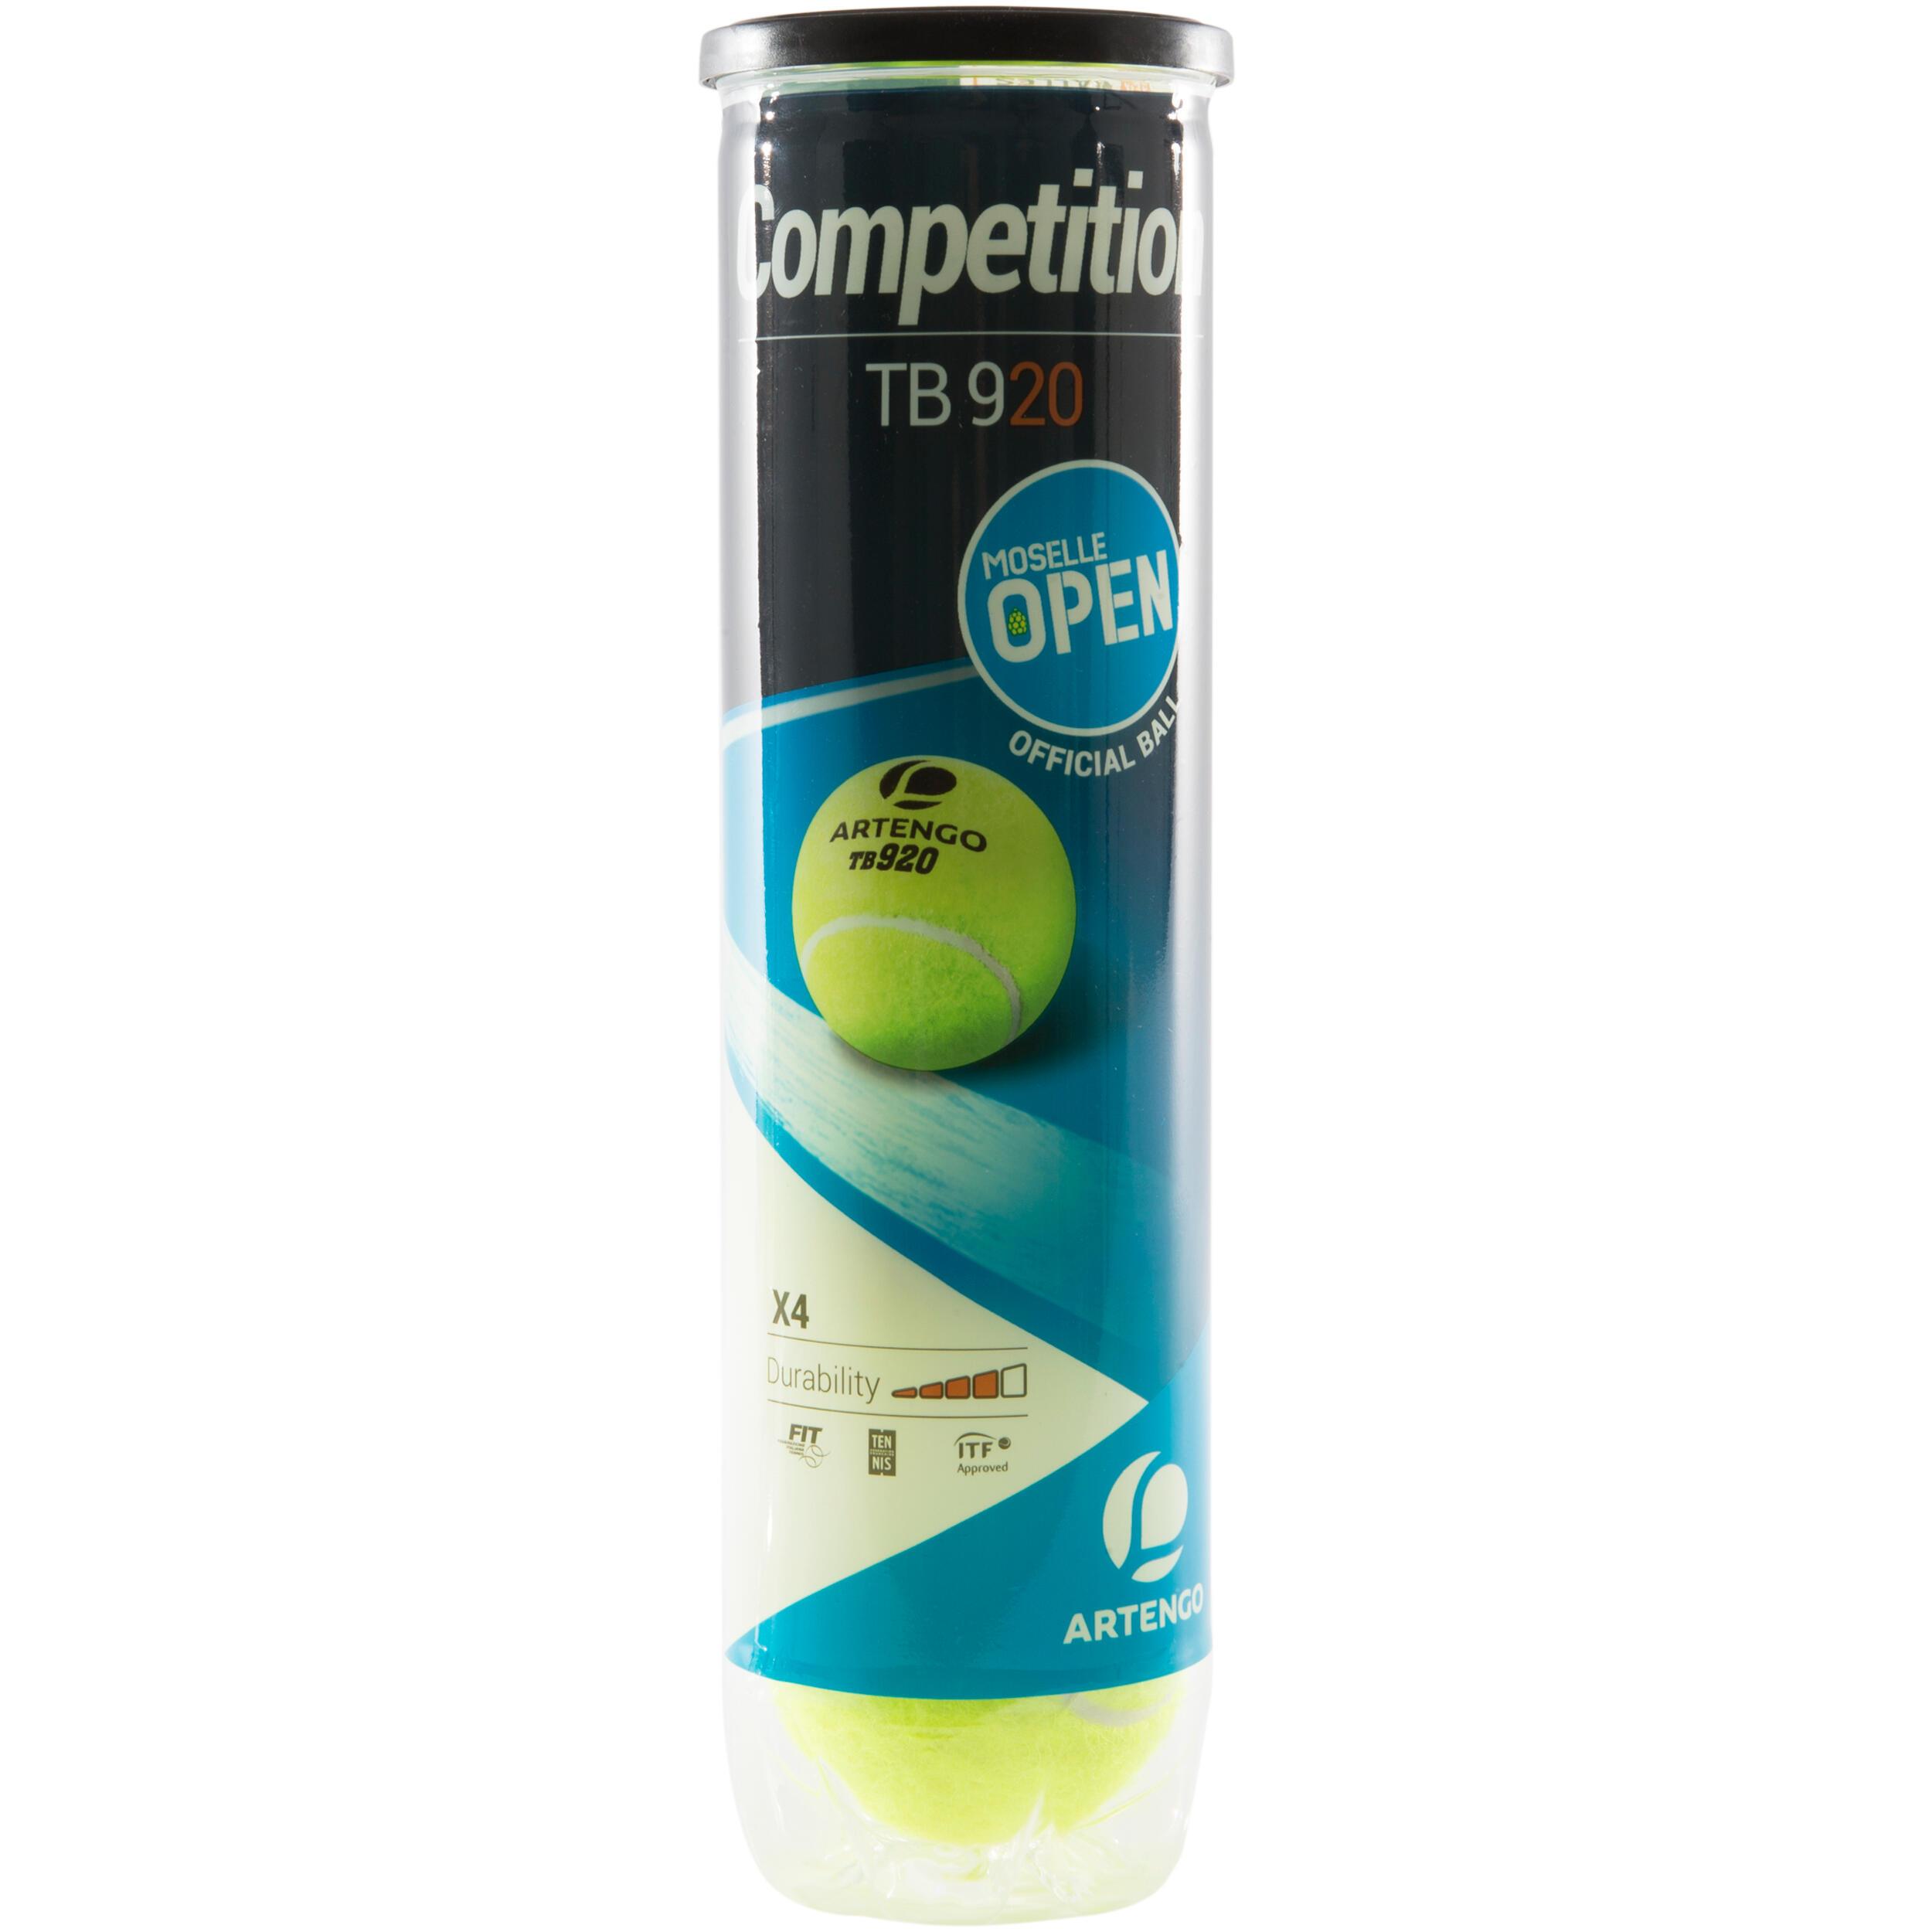 BALLE DE TENNIS PRESSION TB 920 *4 JAUNE